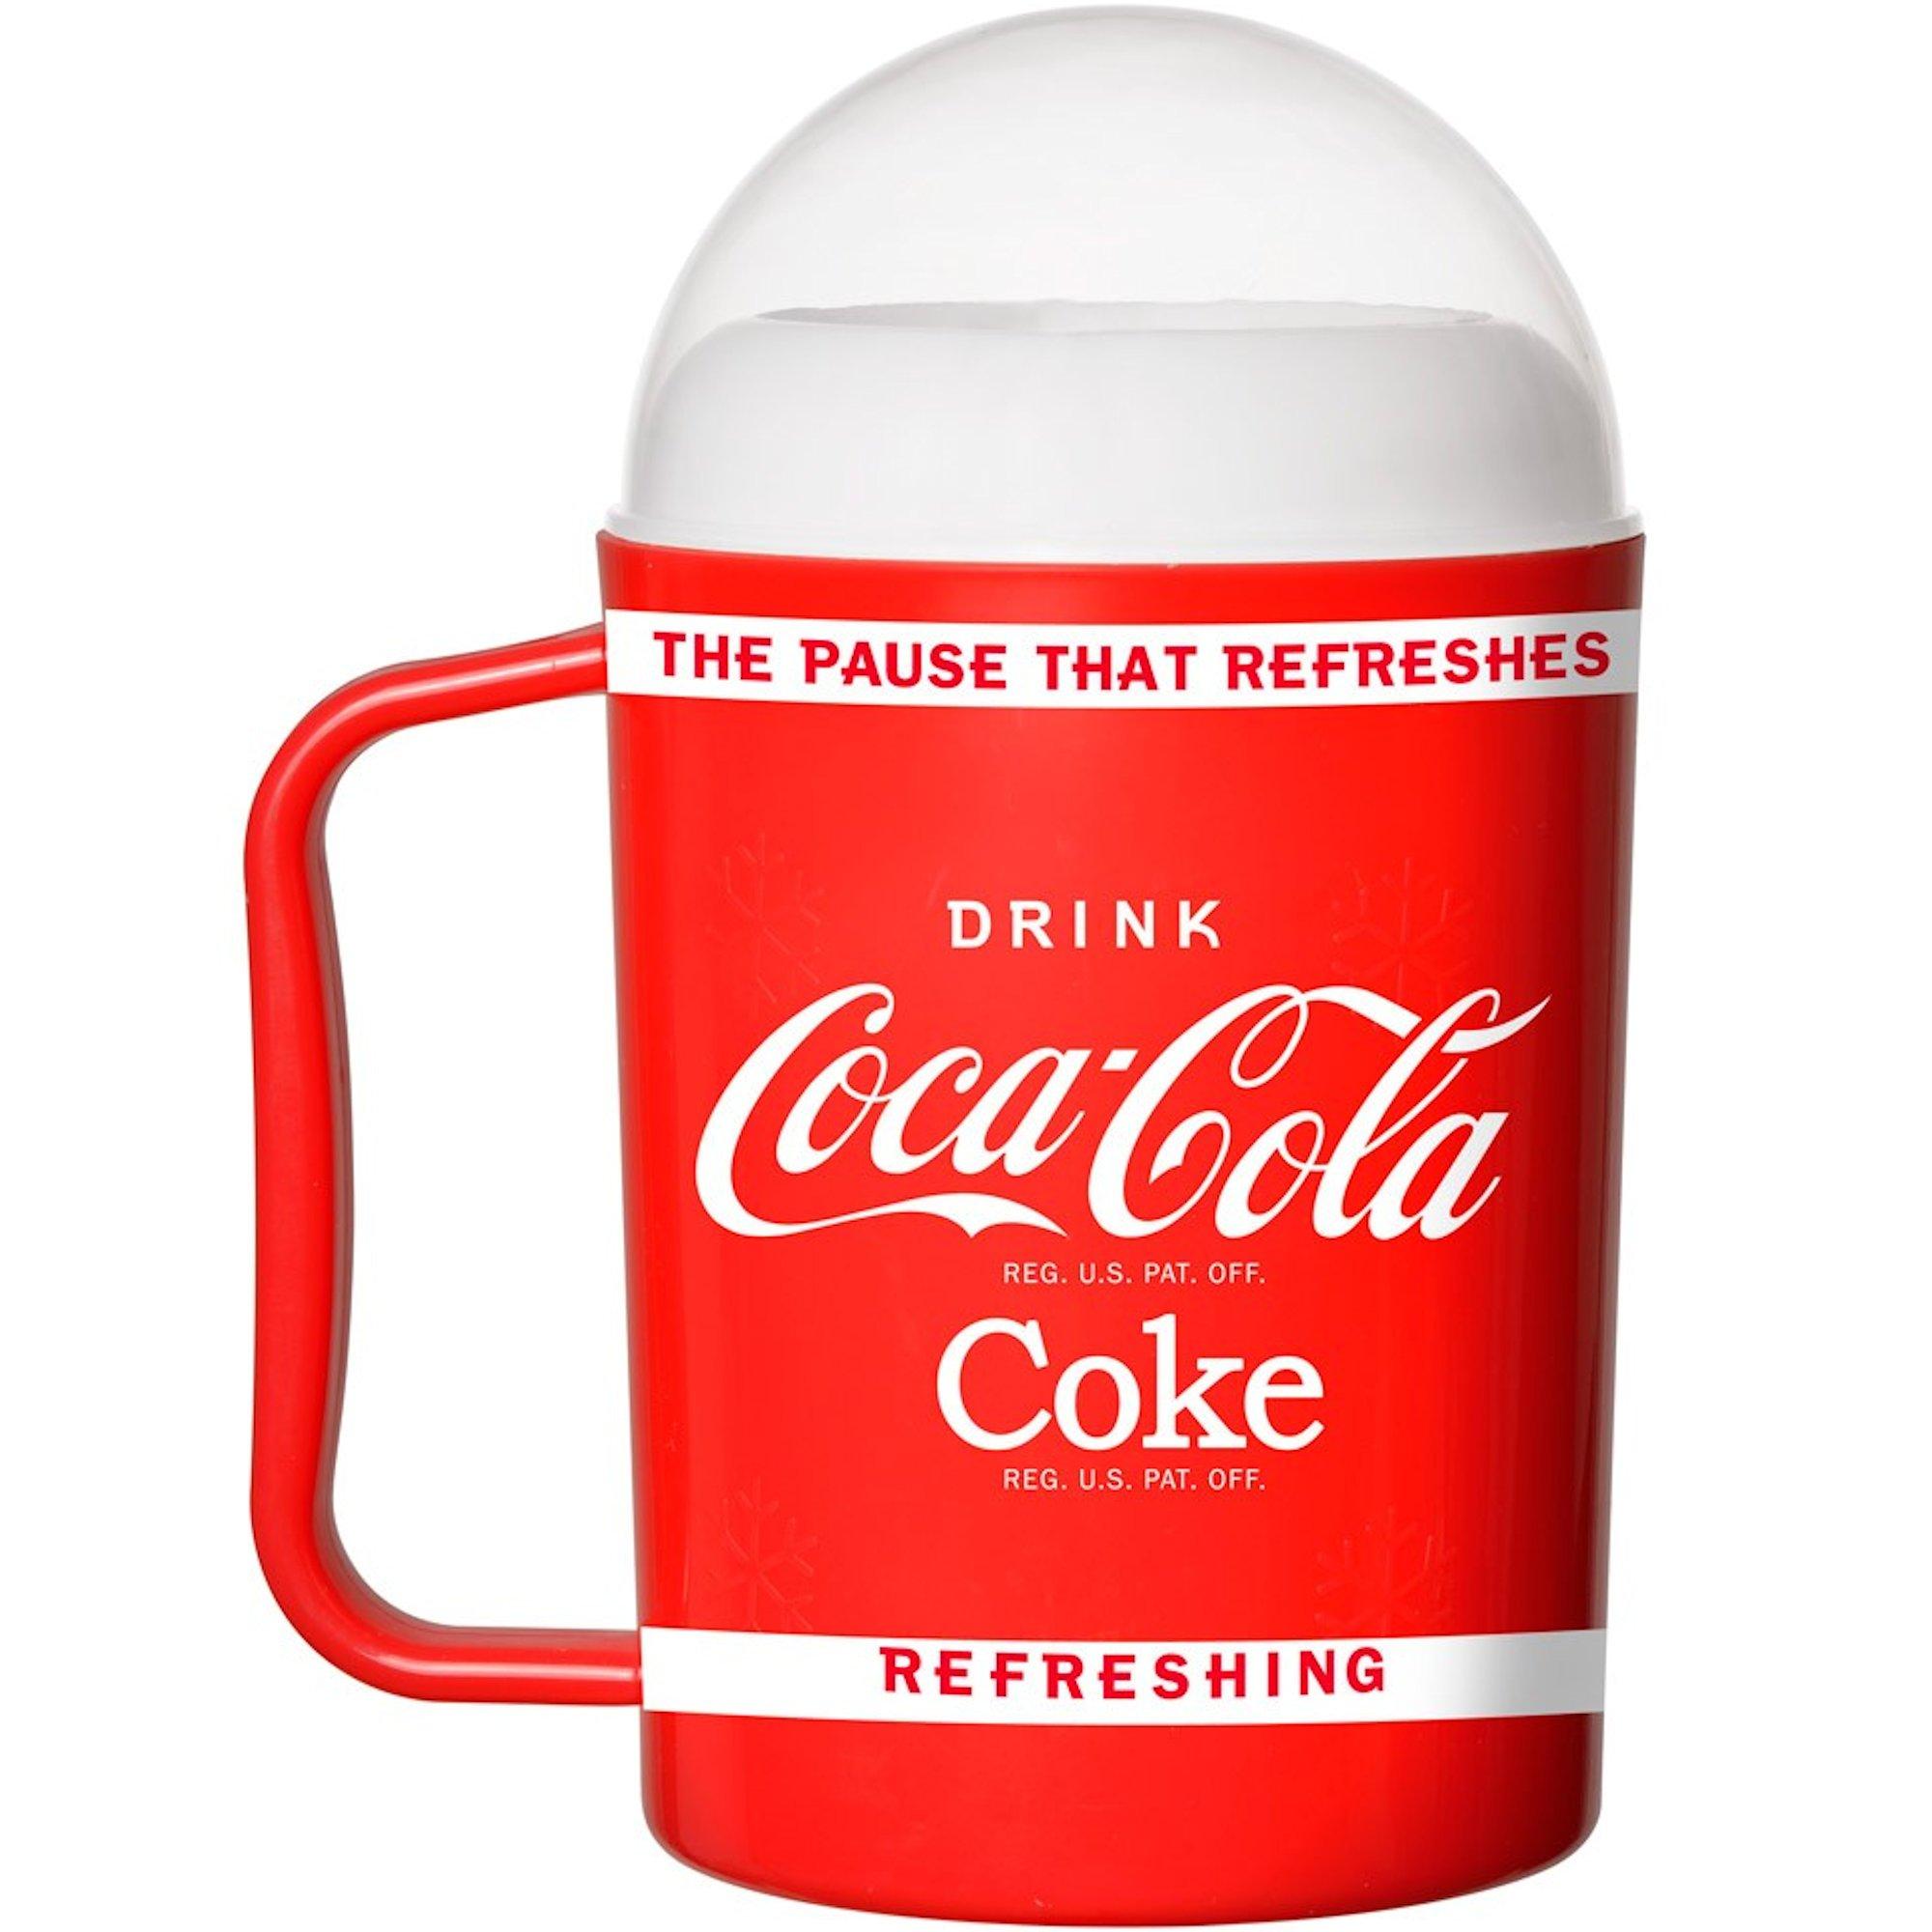 Le Studio Coca Cola Mug With Handle Red Buy Online In Angola At Angola Desertcart Com Productid 96390628